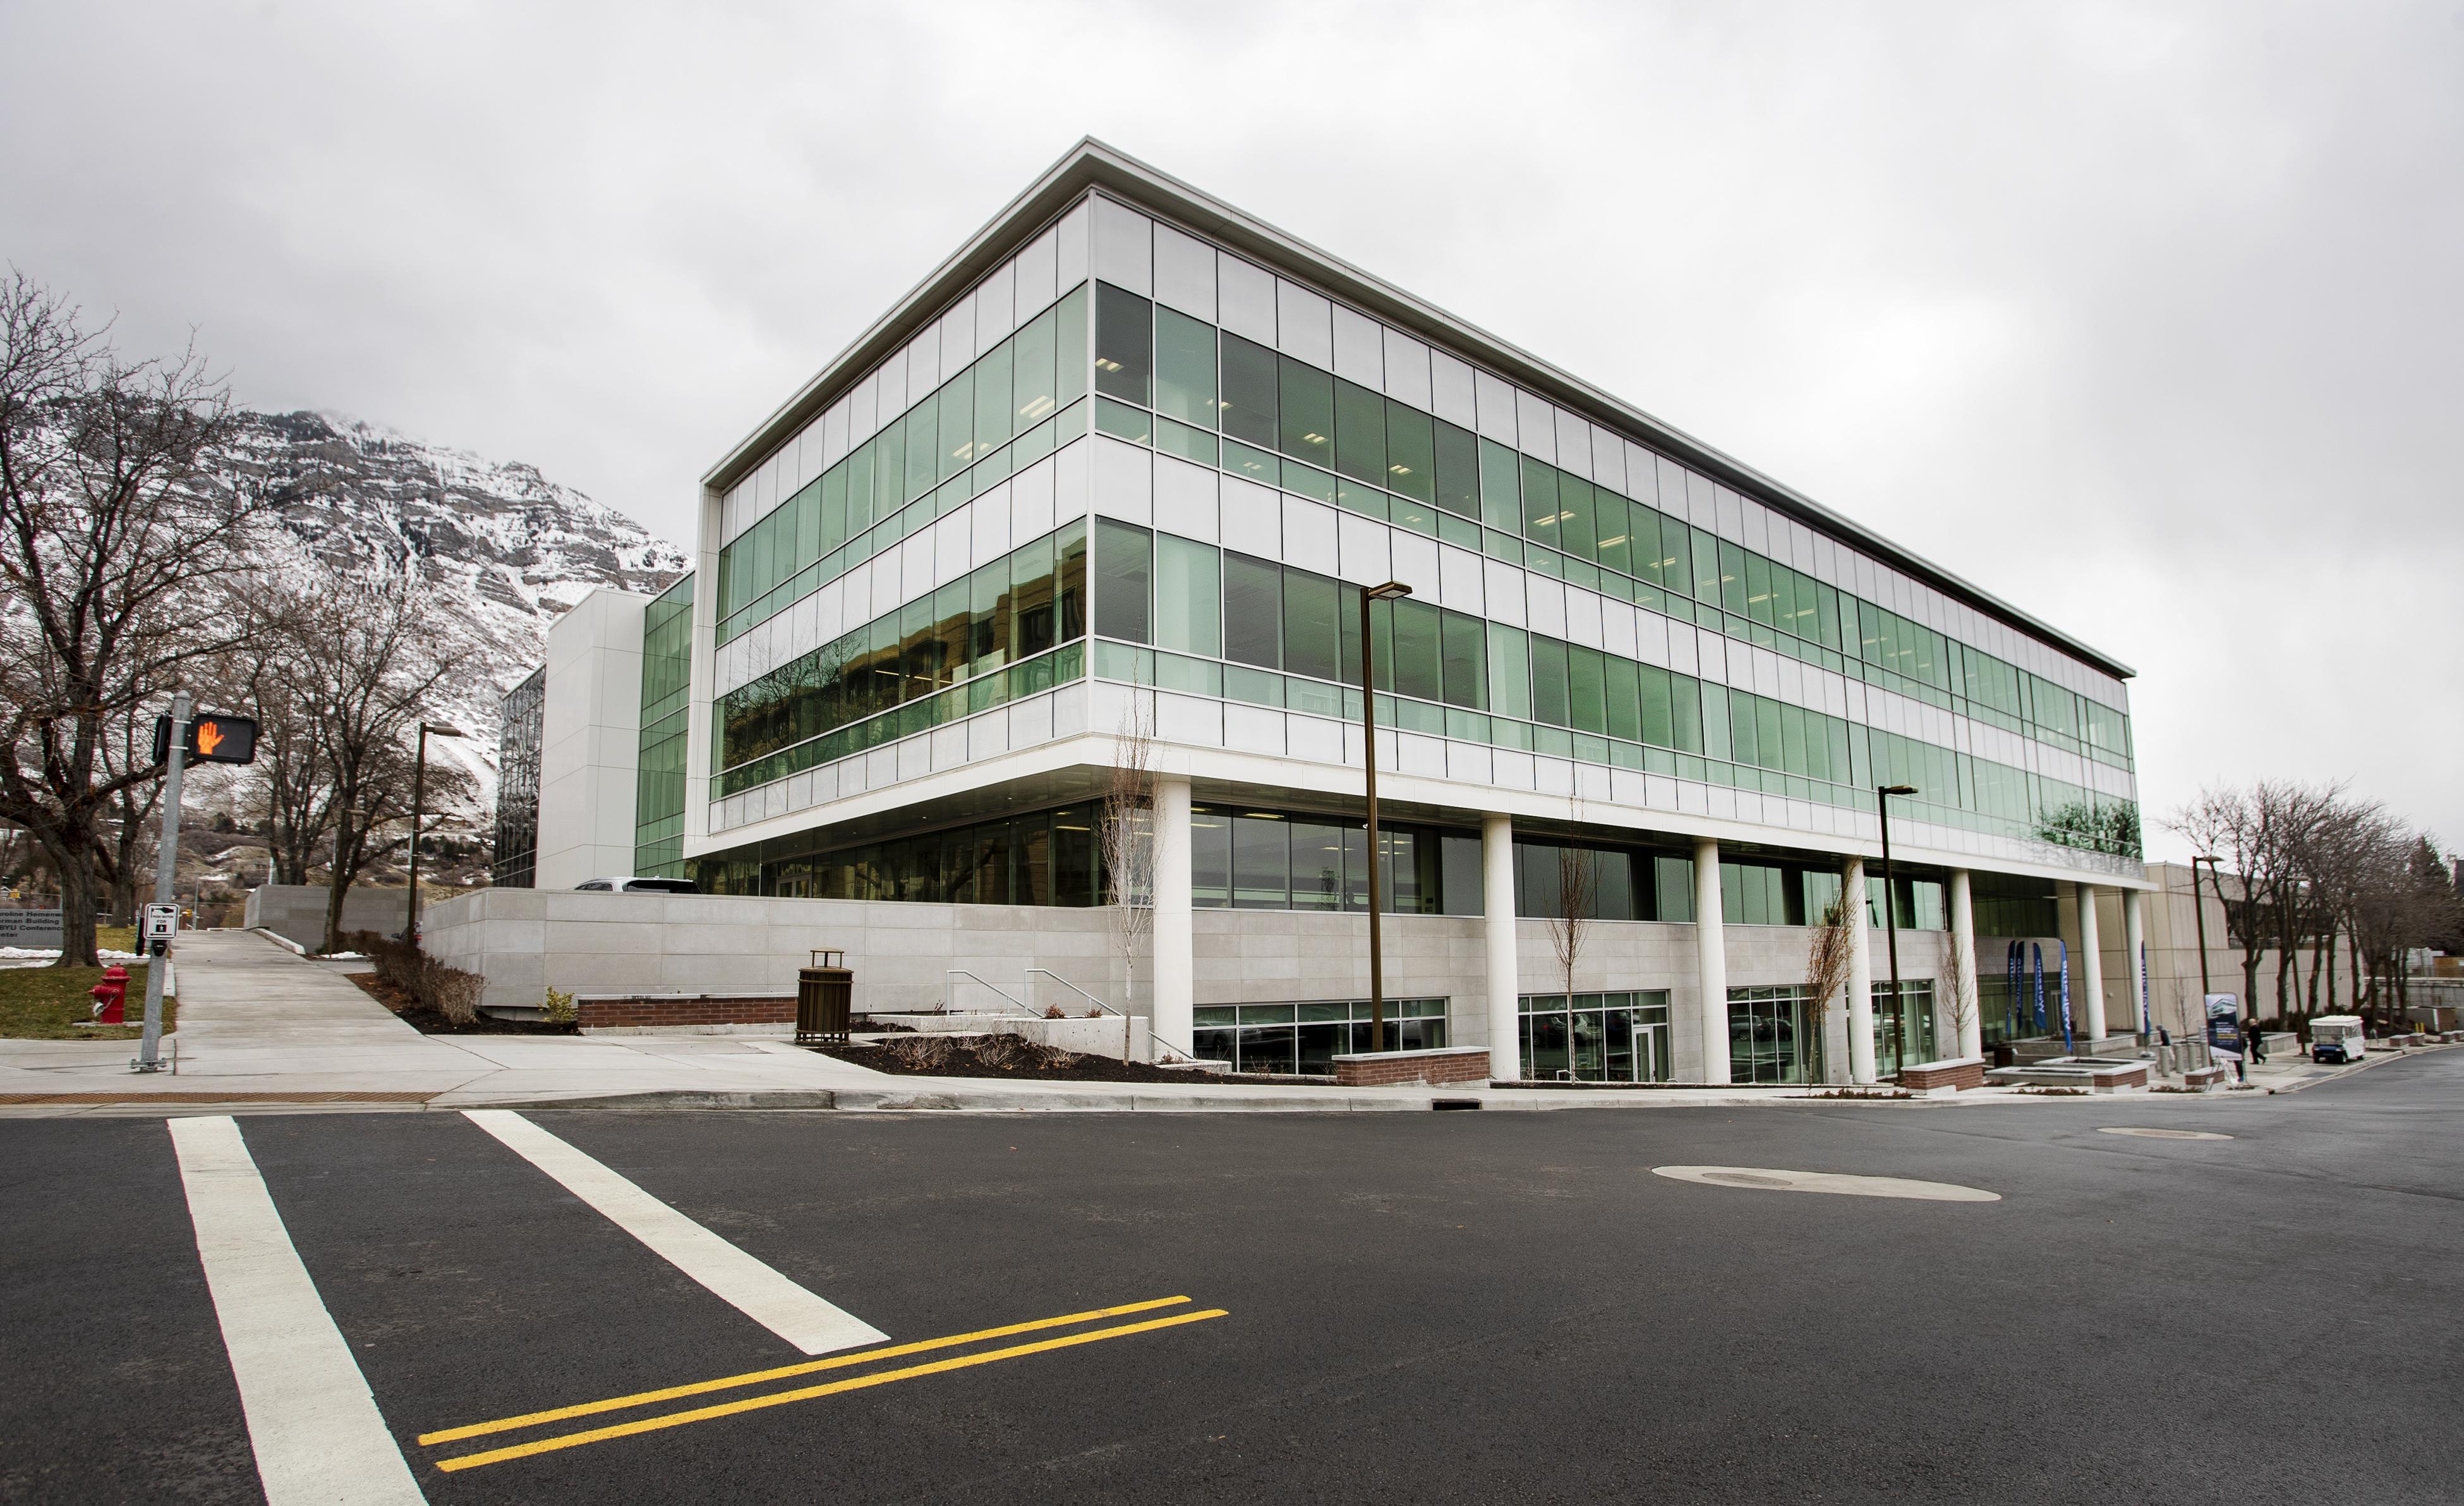 The Caroline Hemenway Harman Building at BYU in Provo, Utah, on Tuesday, Feb. 5, 2019.